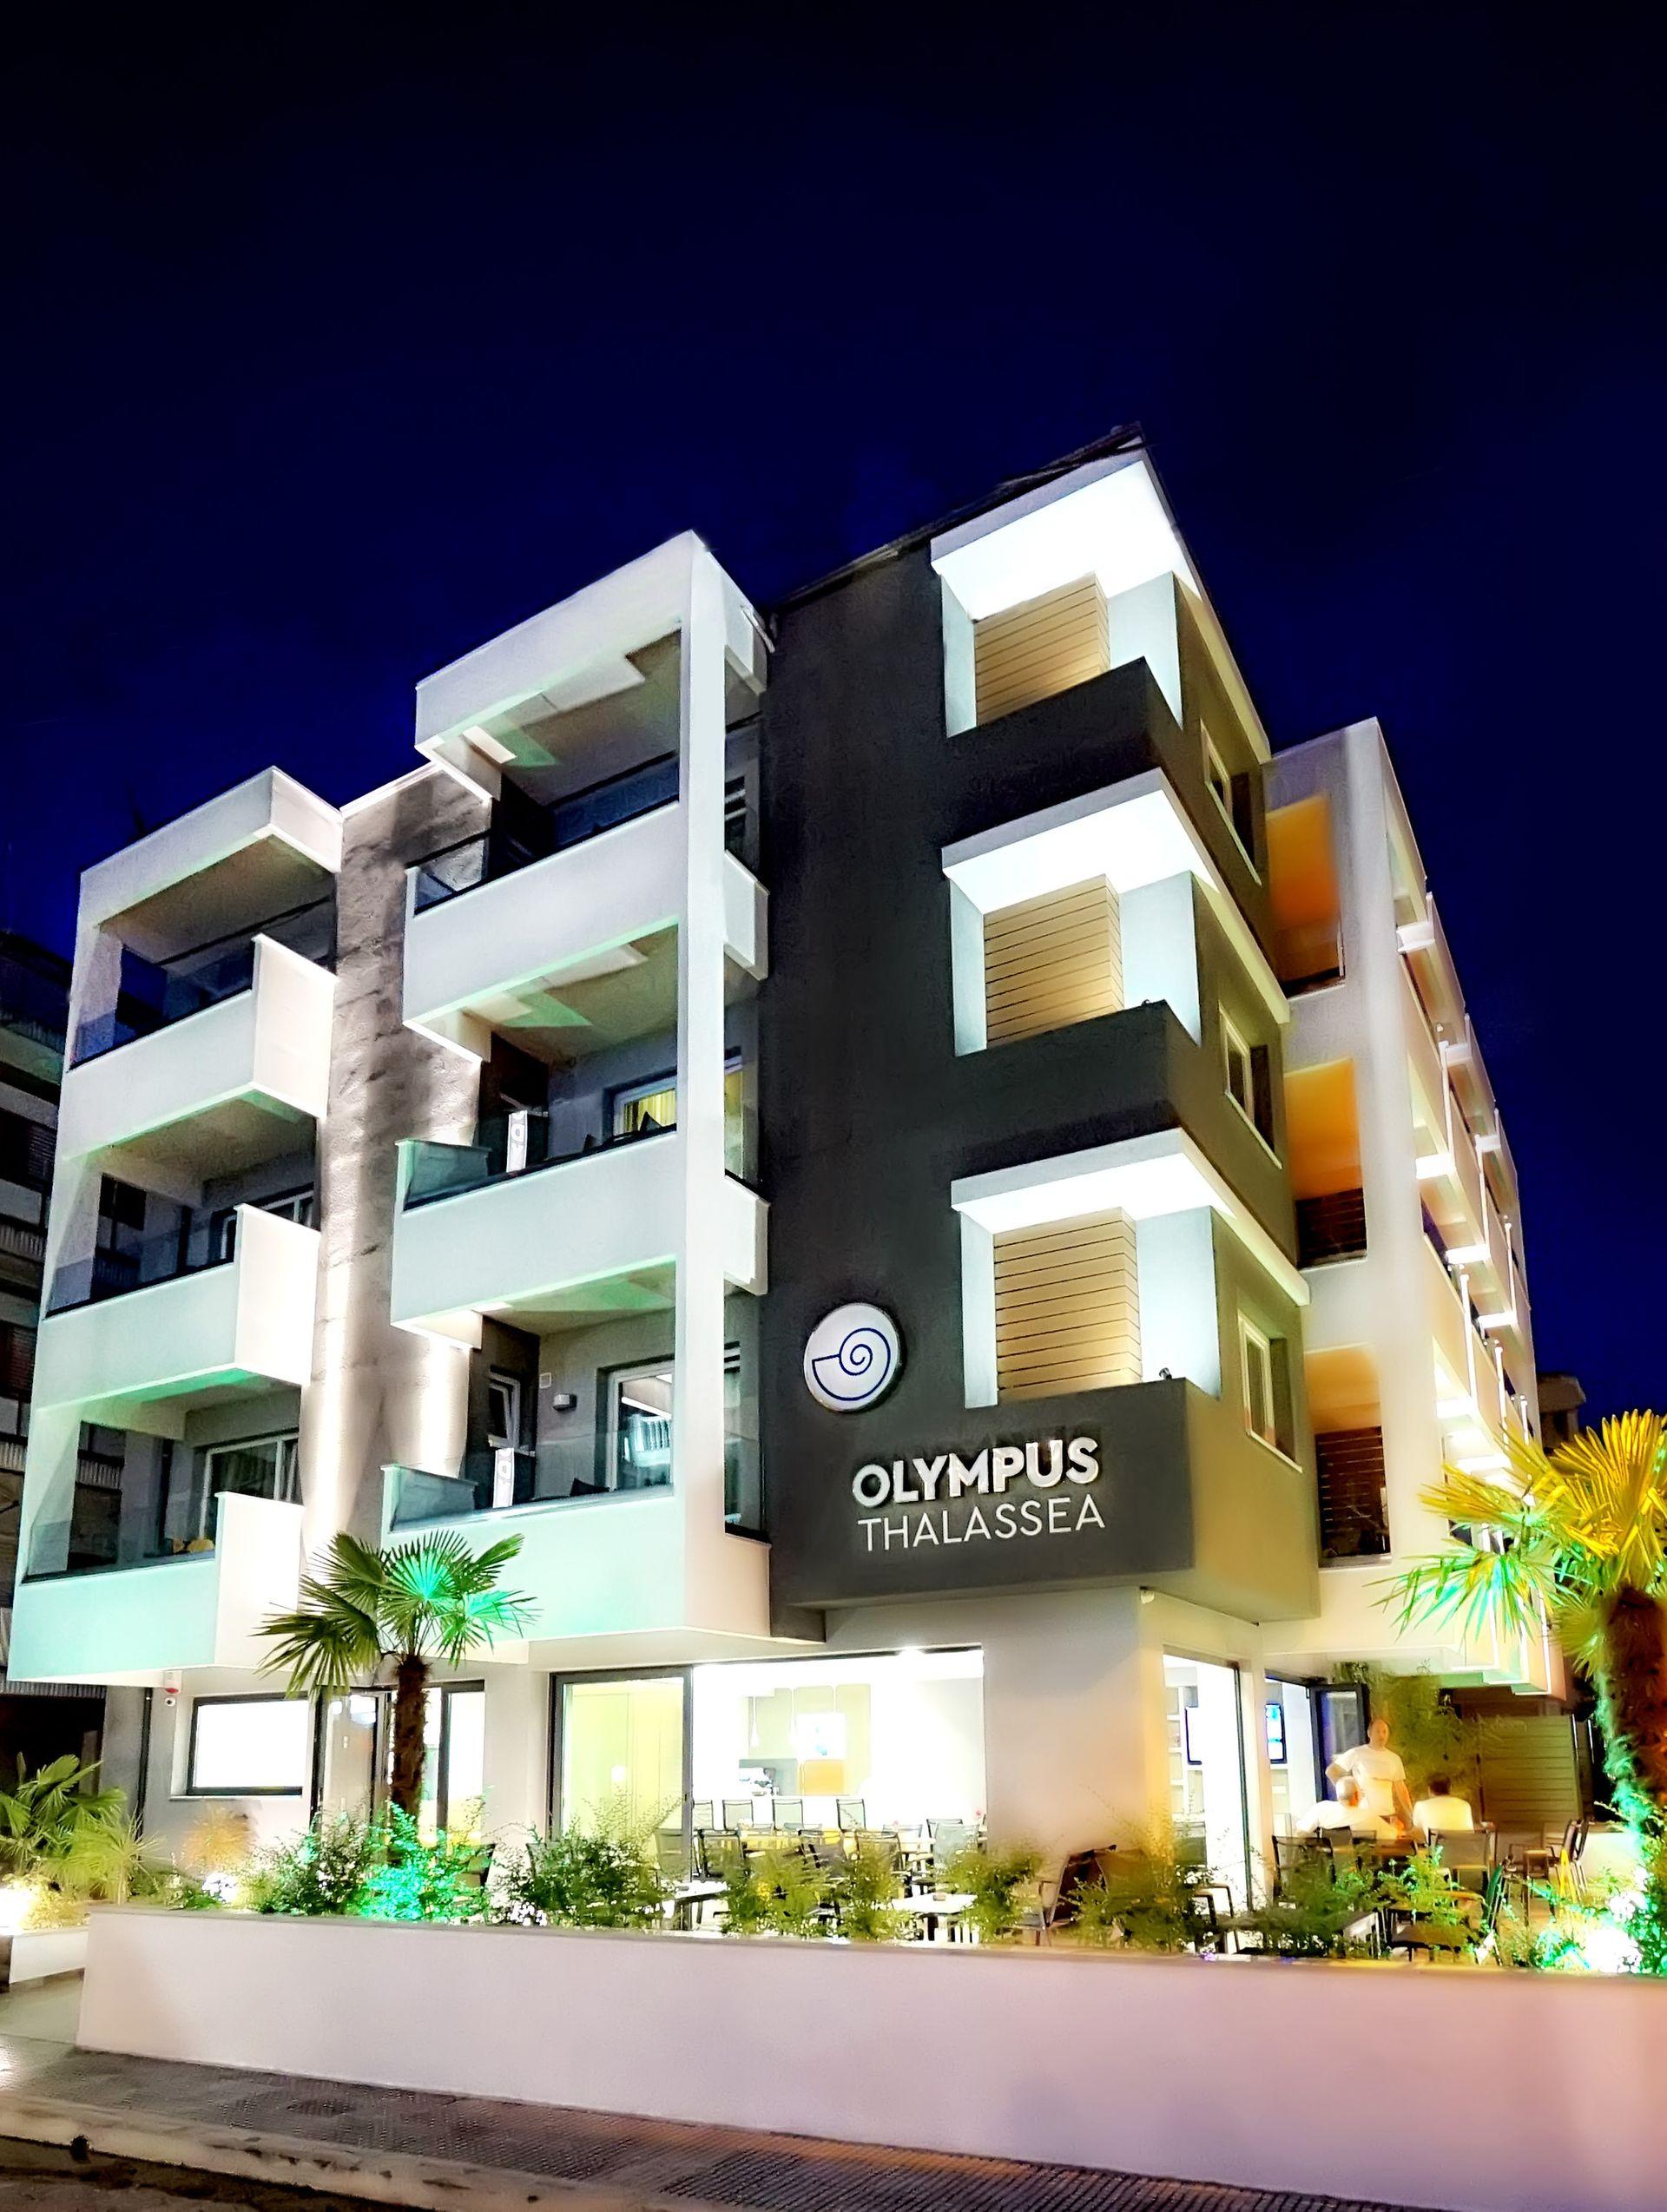 Olympus Thalassea - Παραλία Κατερίνης εικόνα